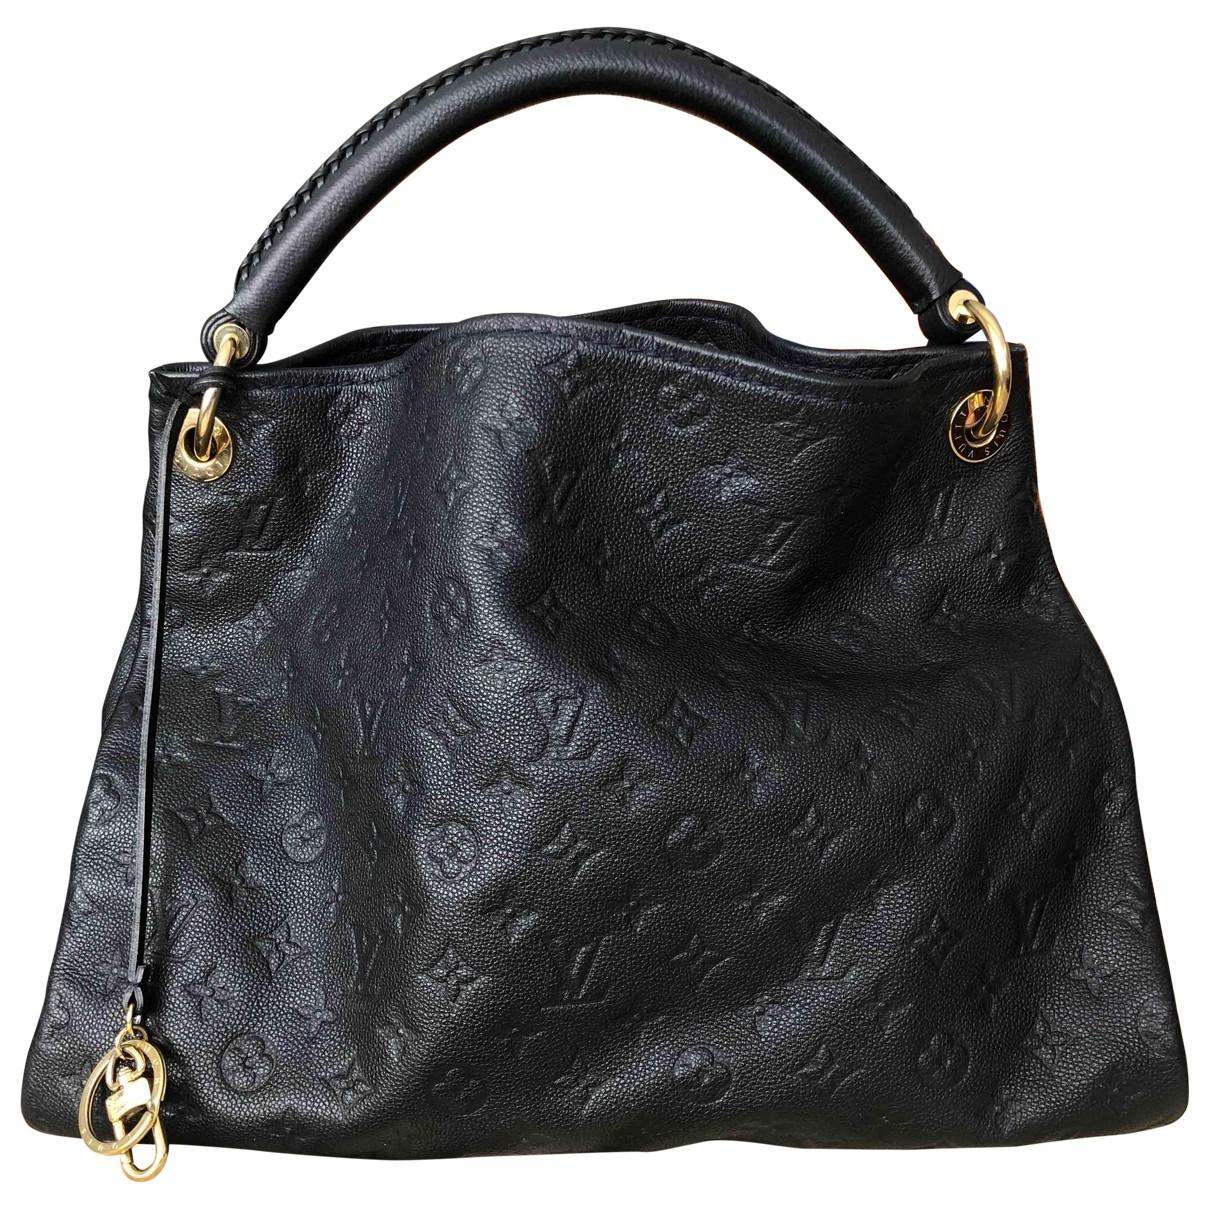 Louis Vuitton Artsy Blue Leather handbag for Women \N